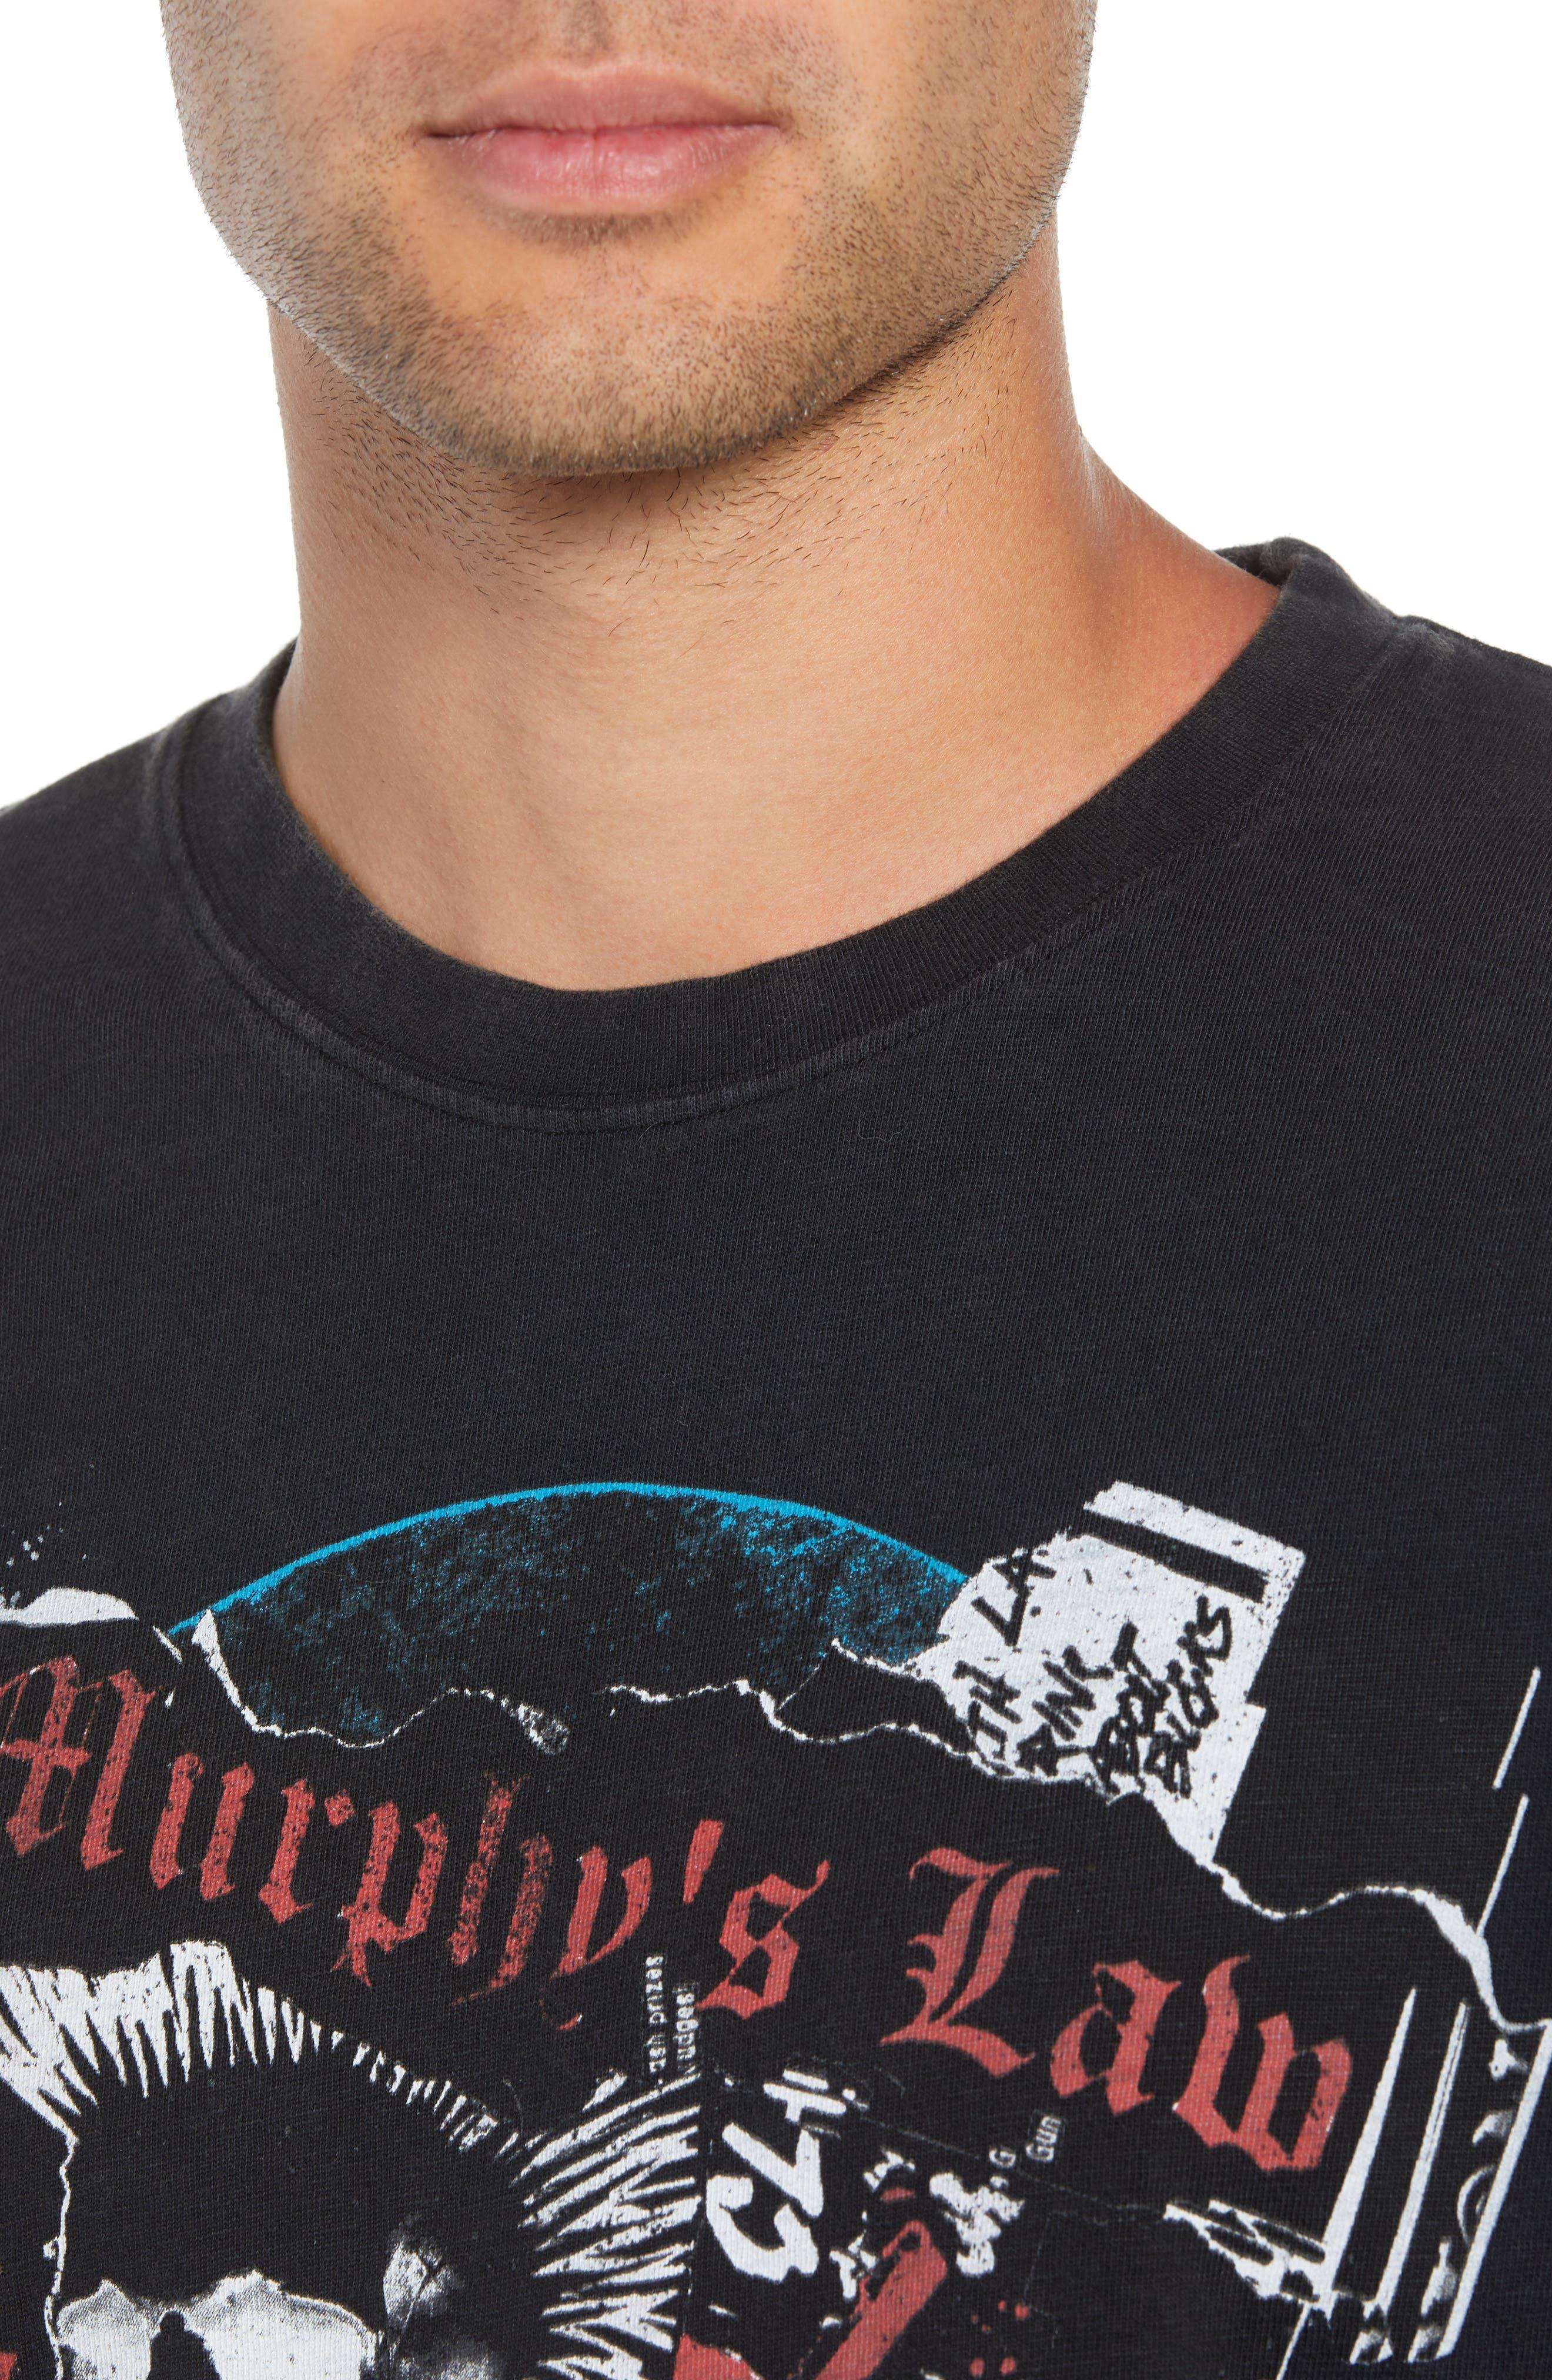 Murphy's Law Graphic T-Shirt,                             Alternate thumbnail 4, color,                             BLACK